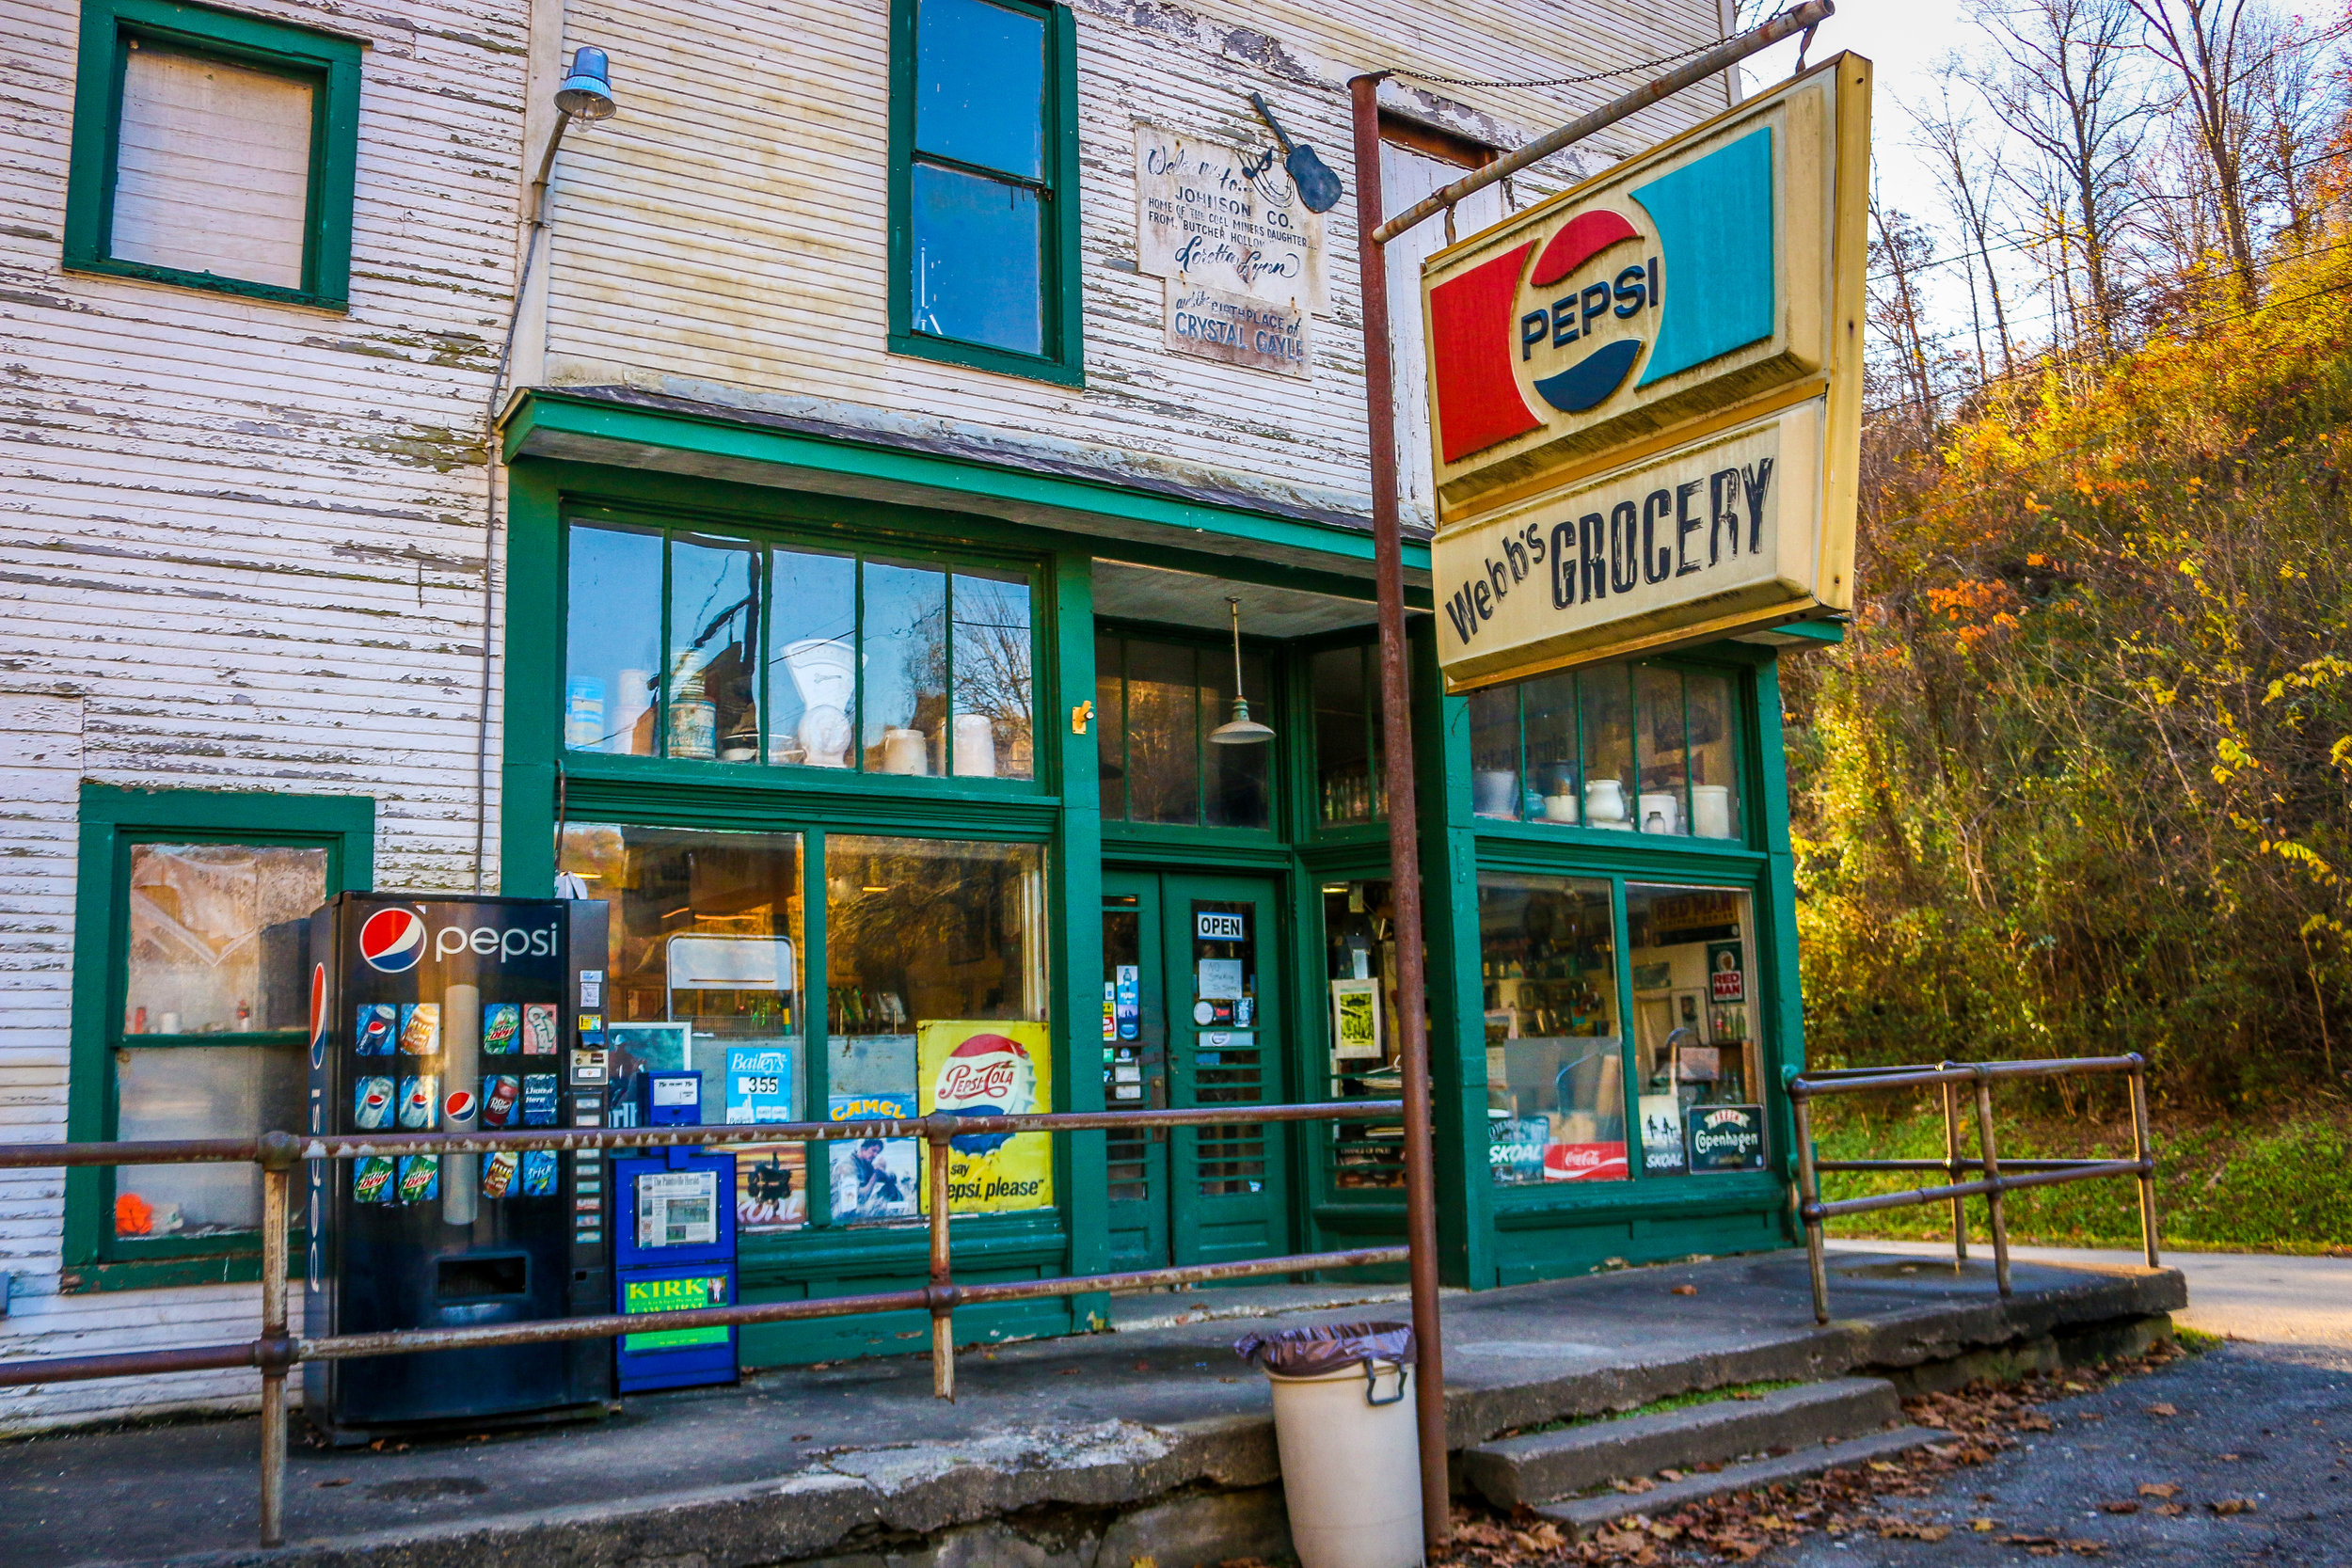 Webb's Grocery in Butcher Hollow